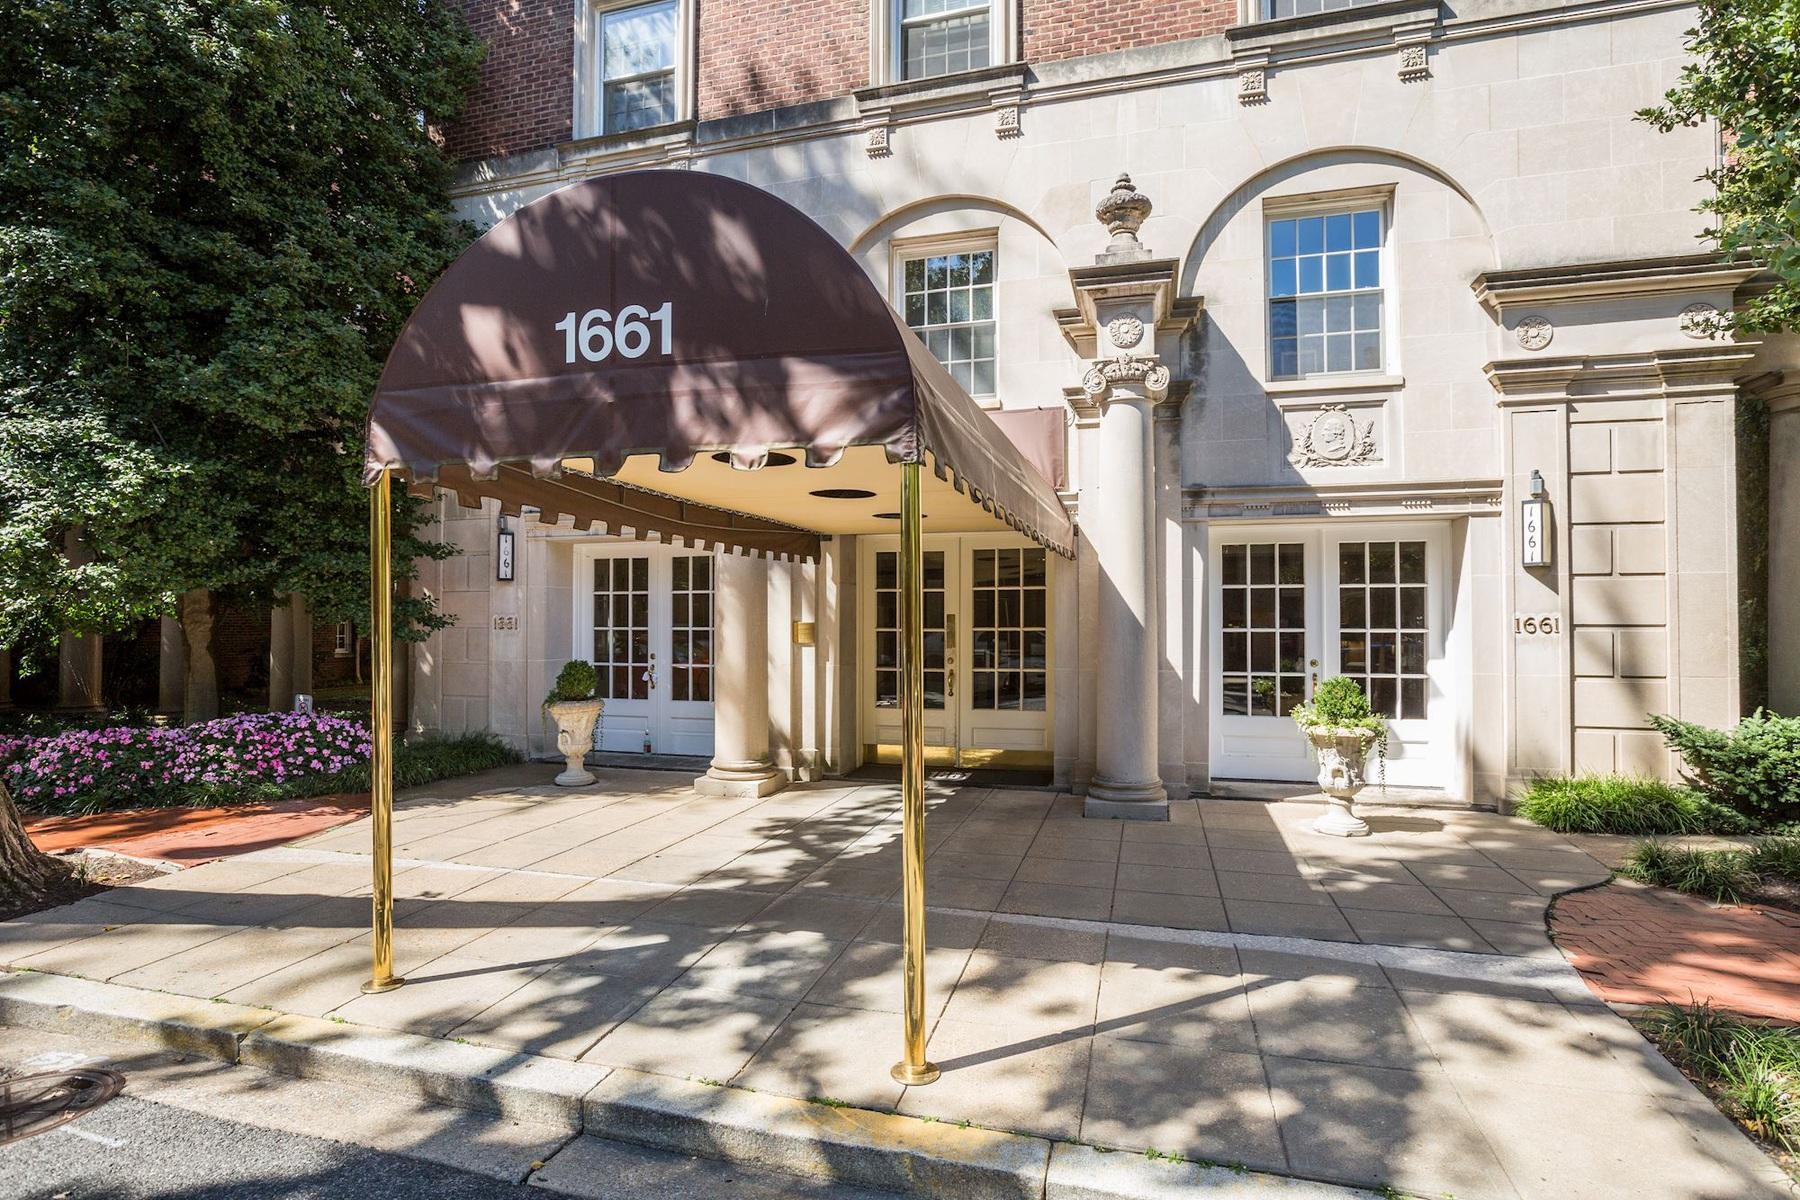 Condominium for Sale at 1661 Crescent Place Nw 210, Washington Washington, District Of Columbia 20009 United States